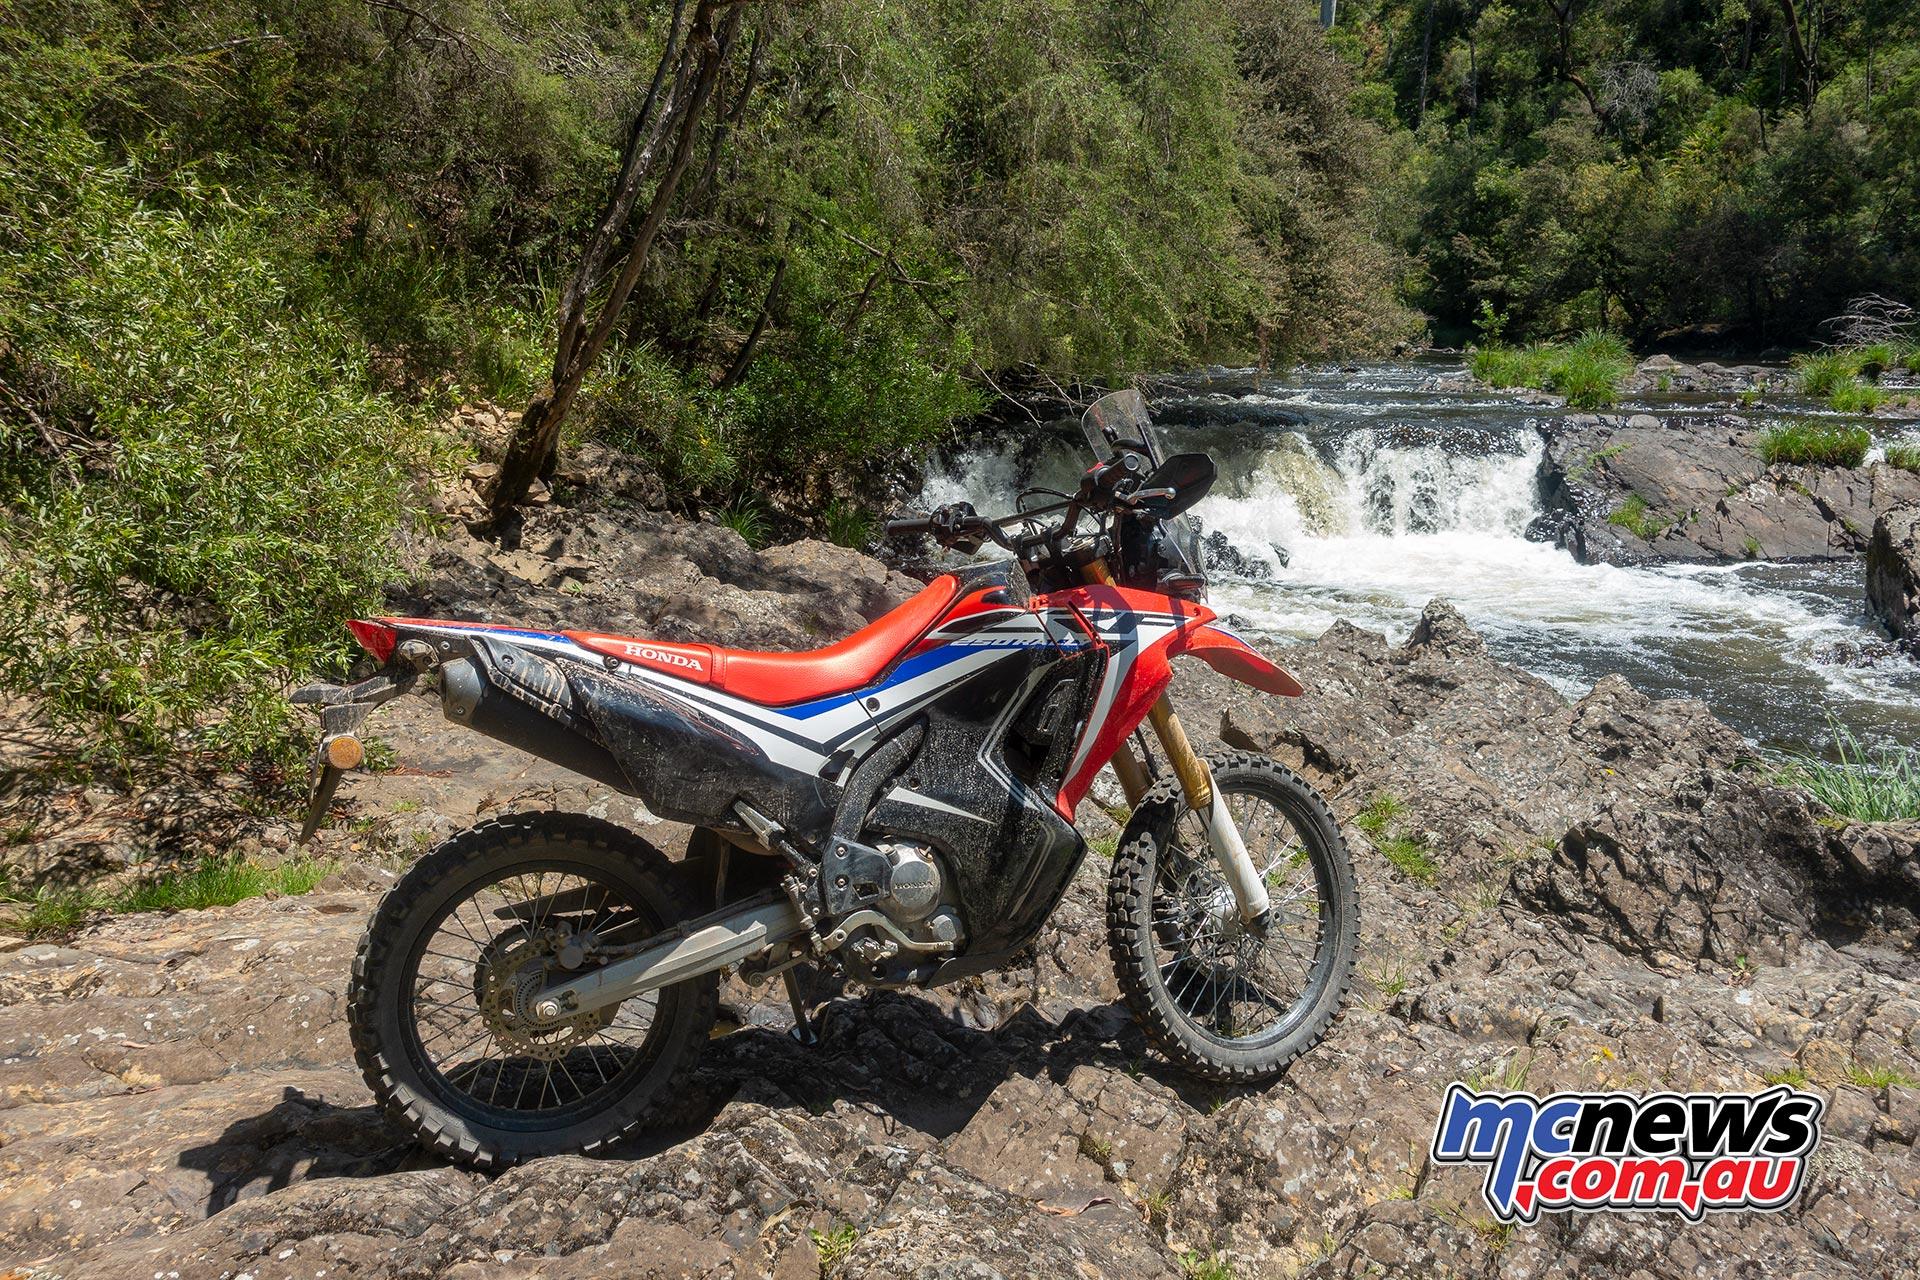 2018 Honda Crf250l Rally Motorcycle Test Mcnewscomau